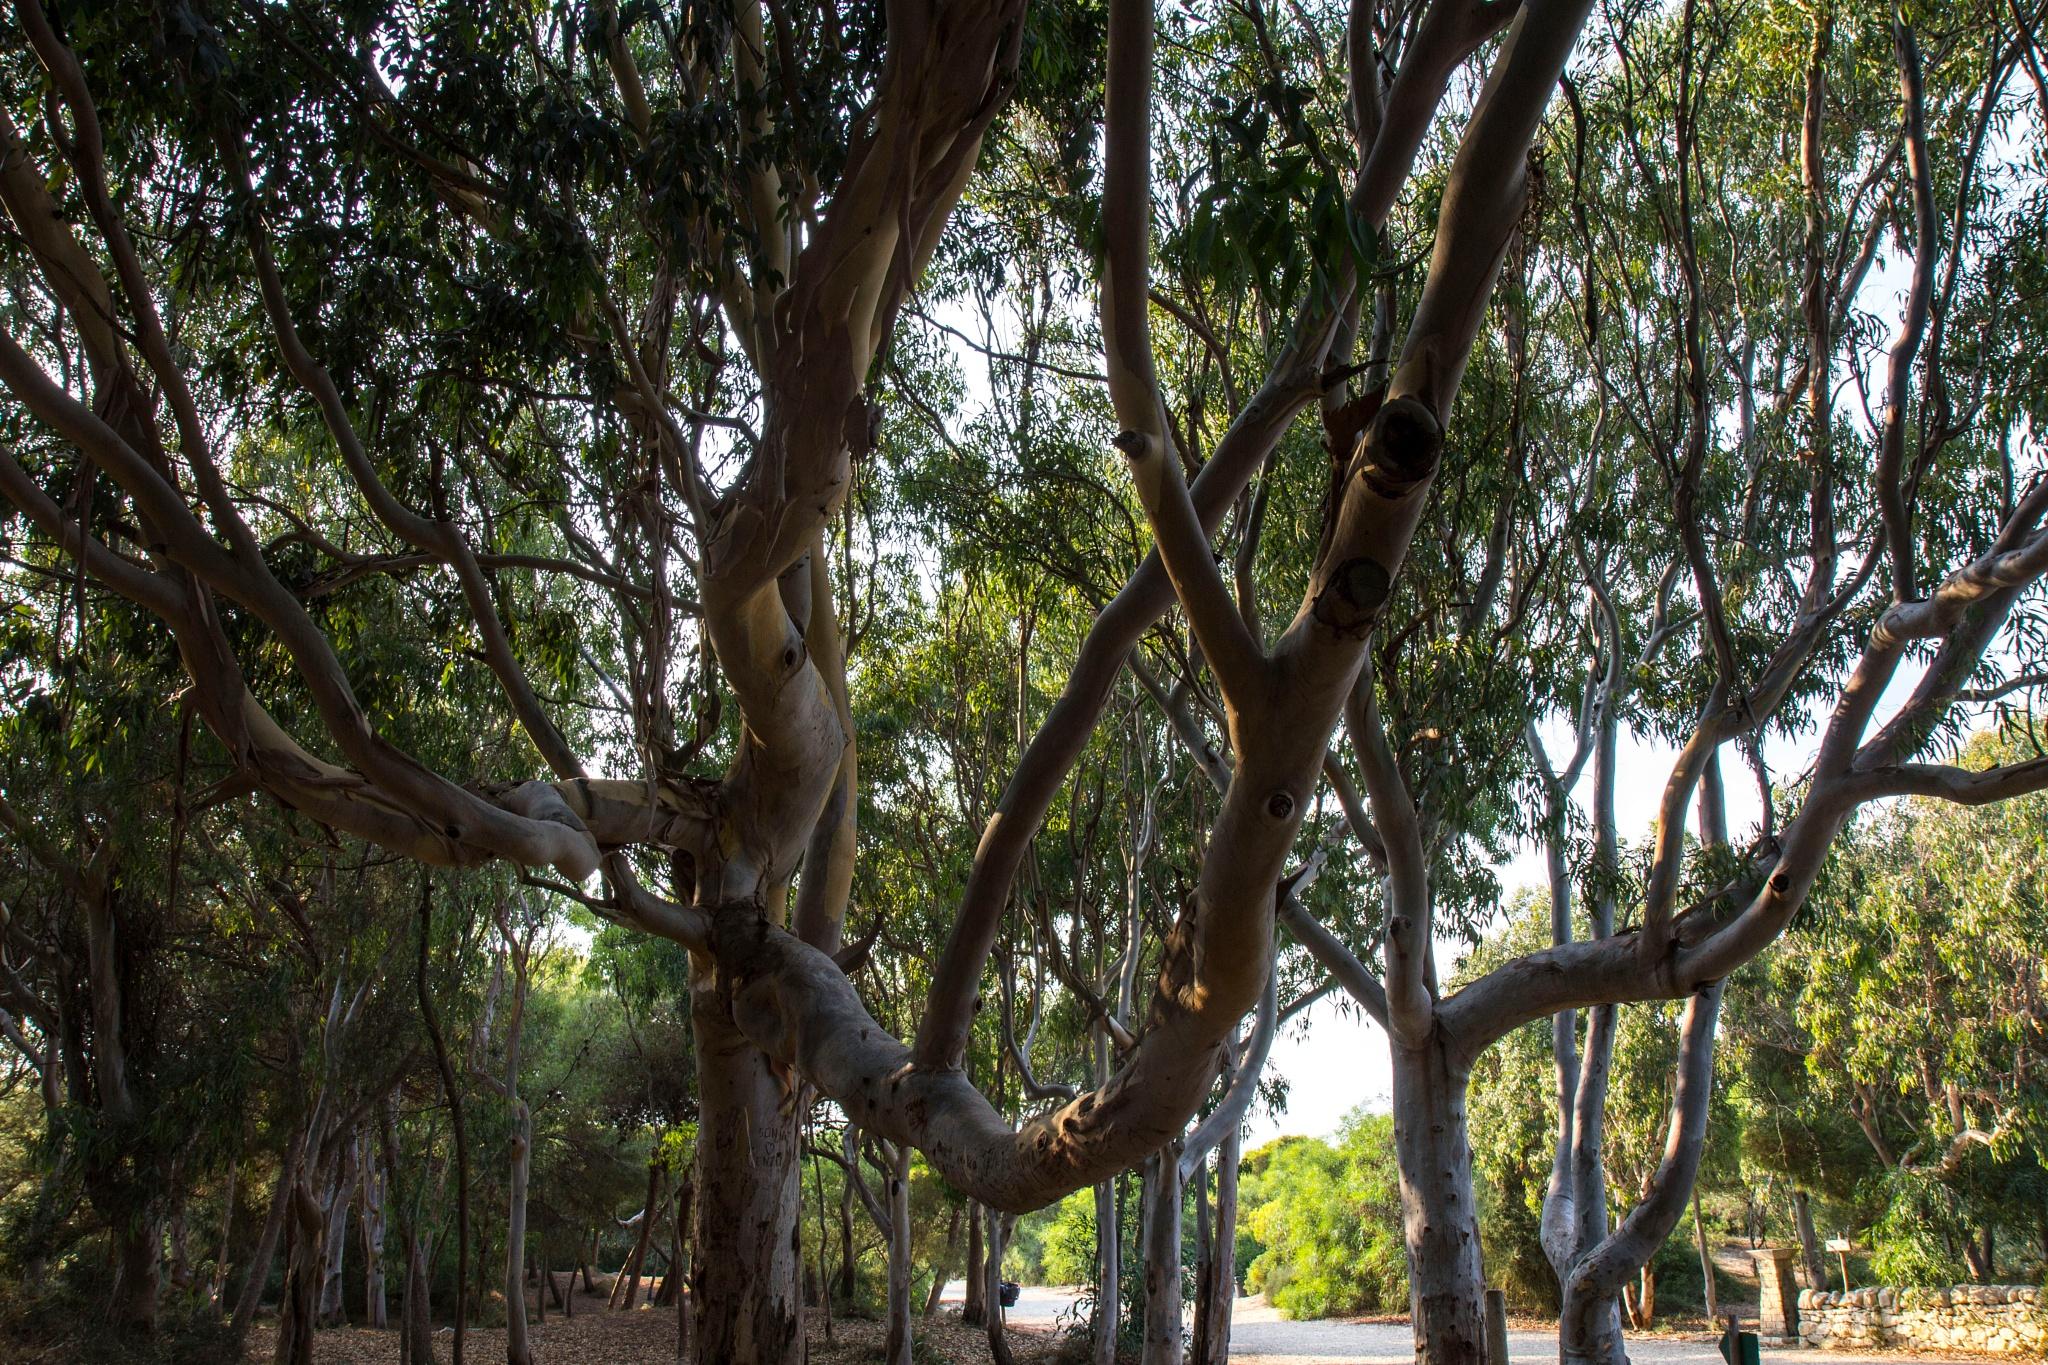 eucalyptus in sicily by alextrusty